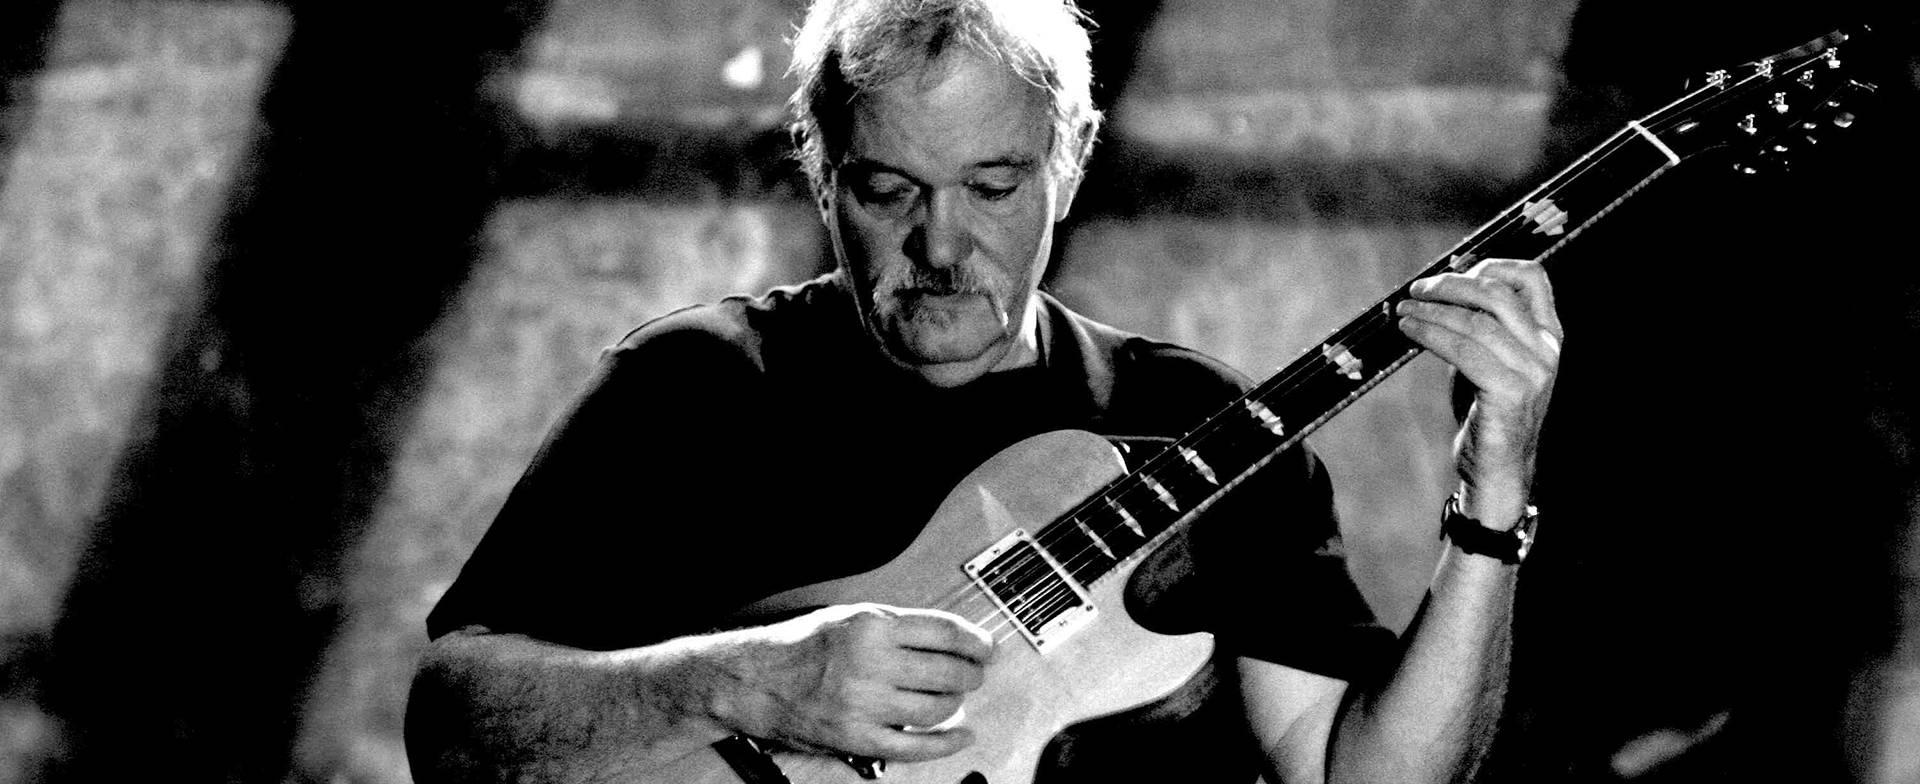 Guitar Master John Abercrombie Brings His Stellar Quartet to Birdland